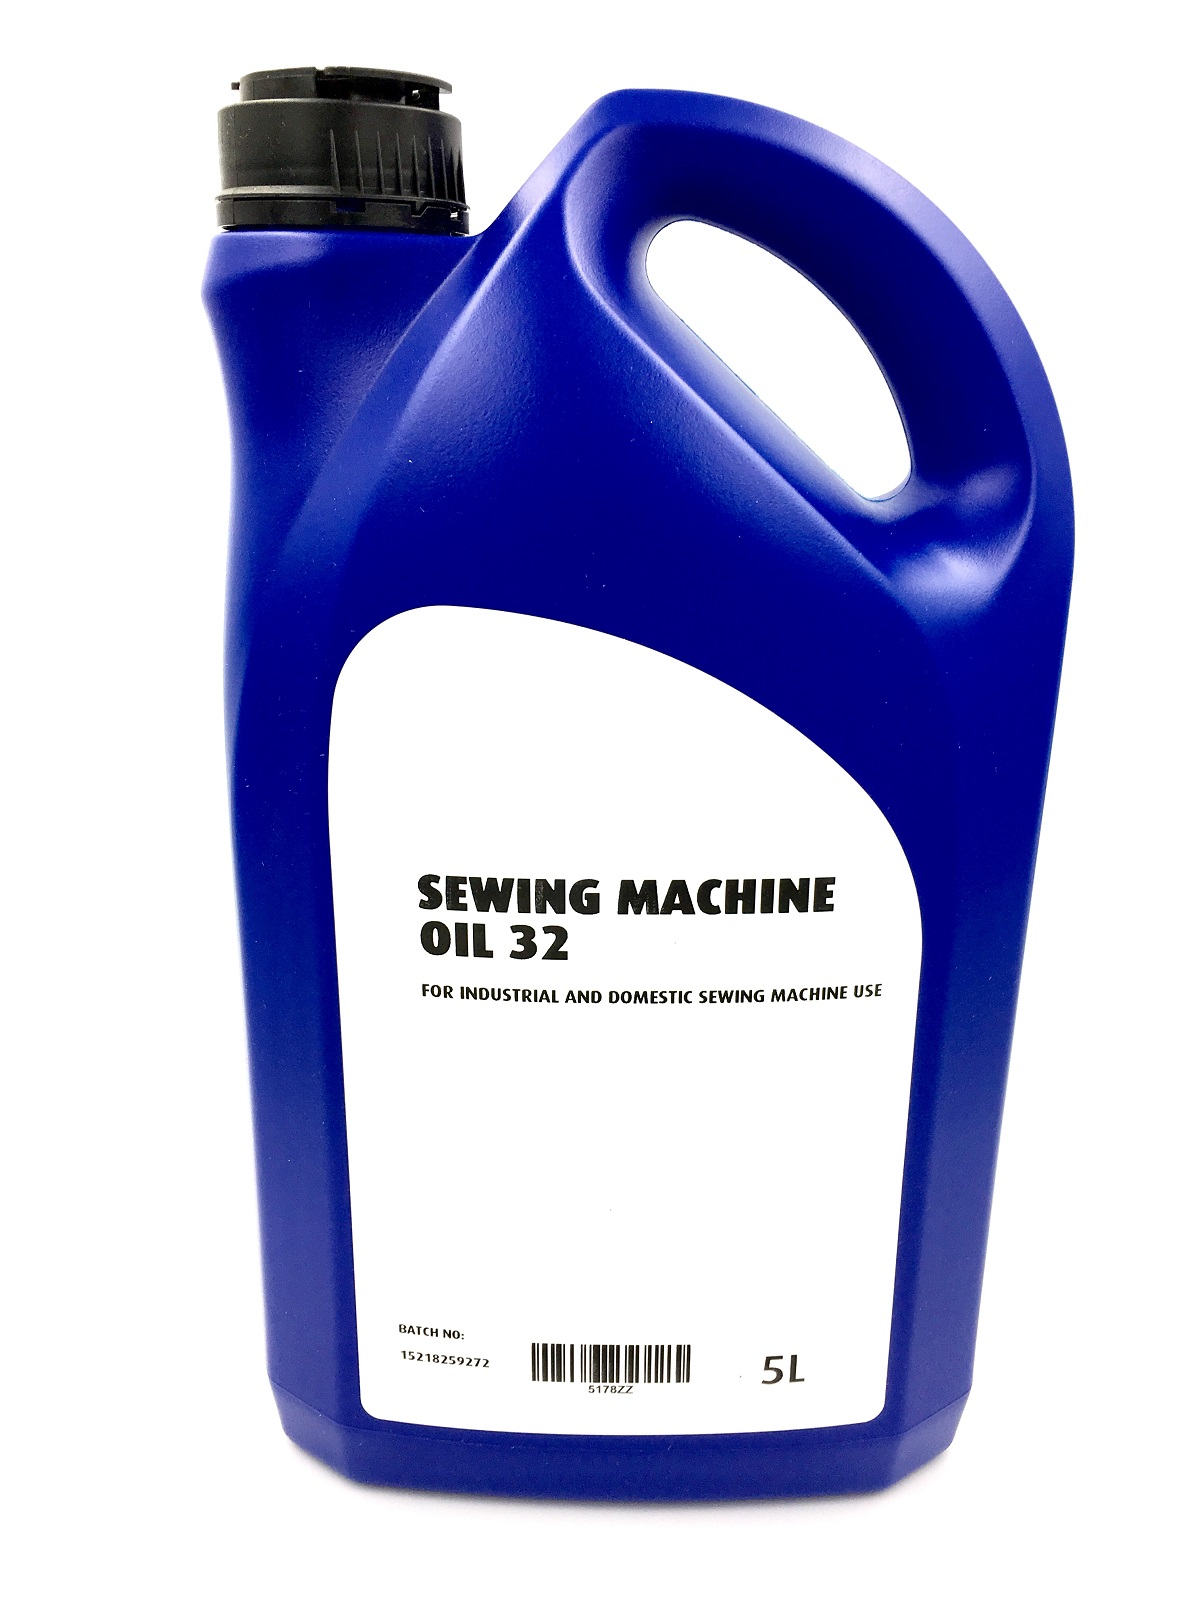 5 Litre Sewing Machine Oil